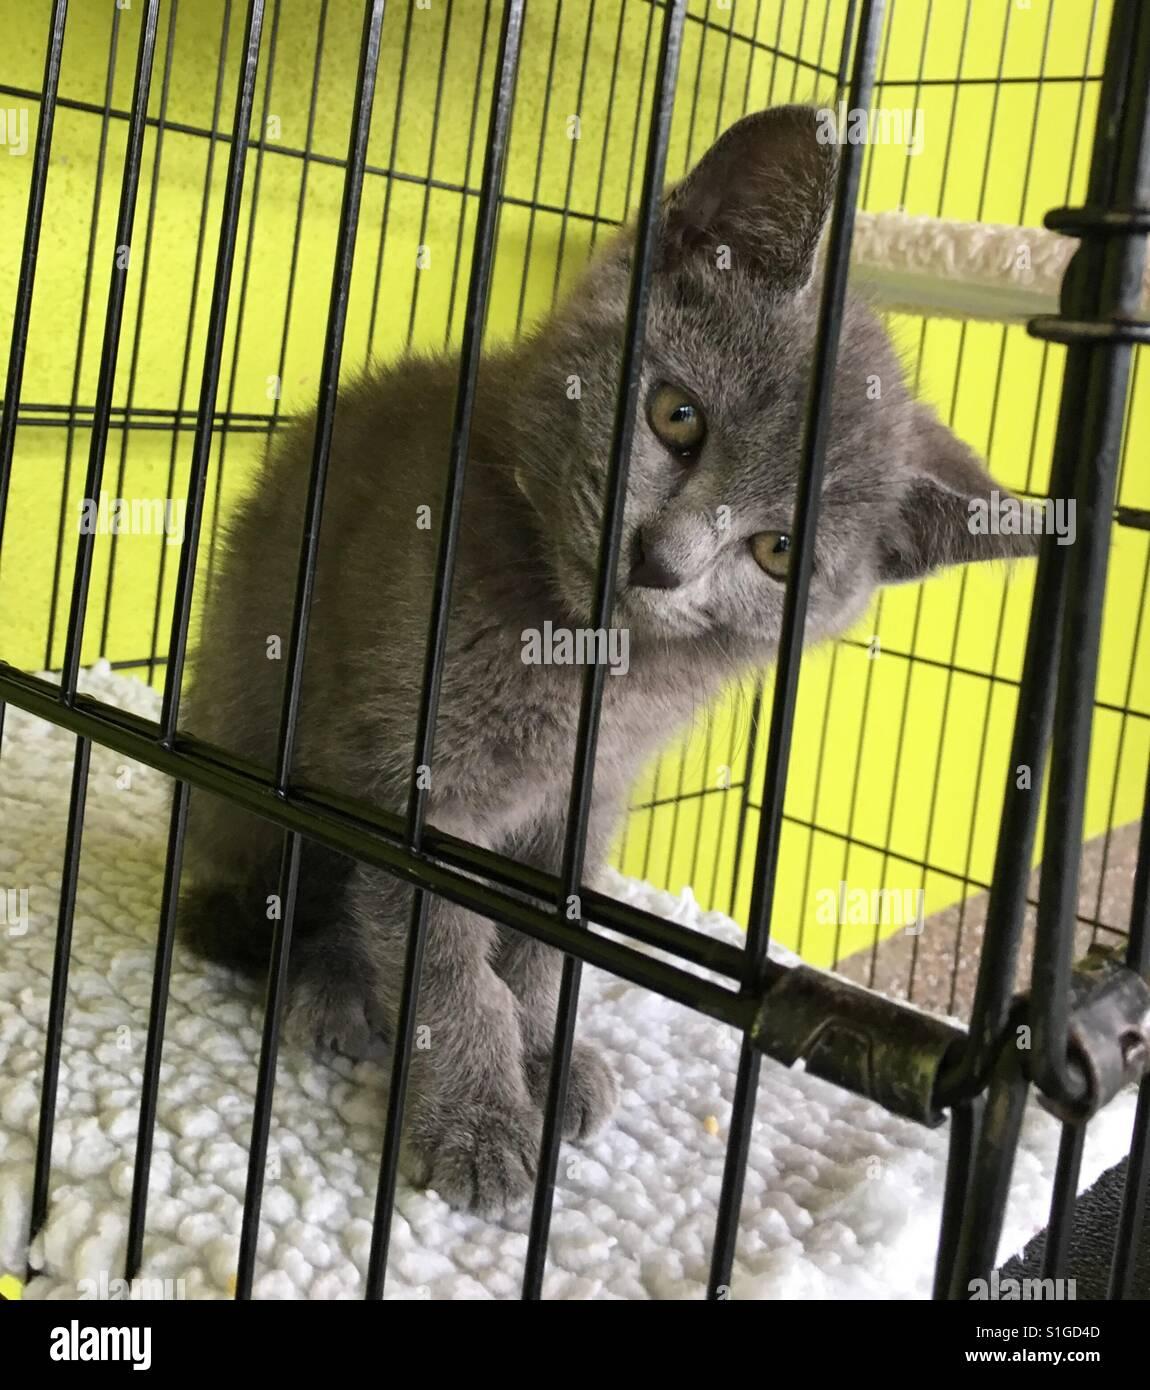 Kitten I n cage waiting adoption - Stock Image